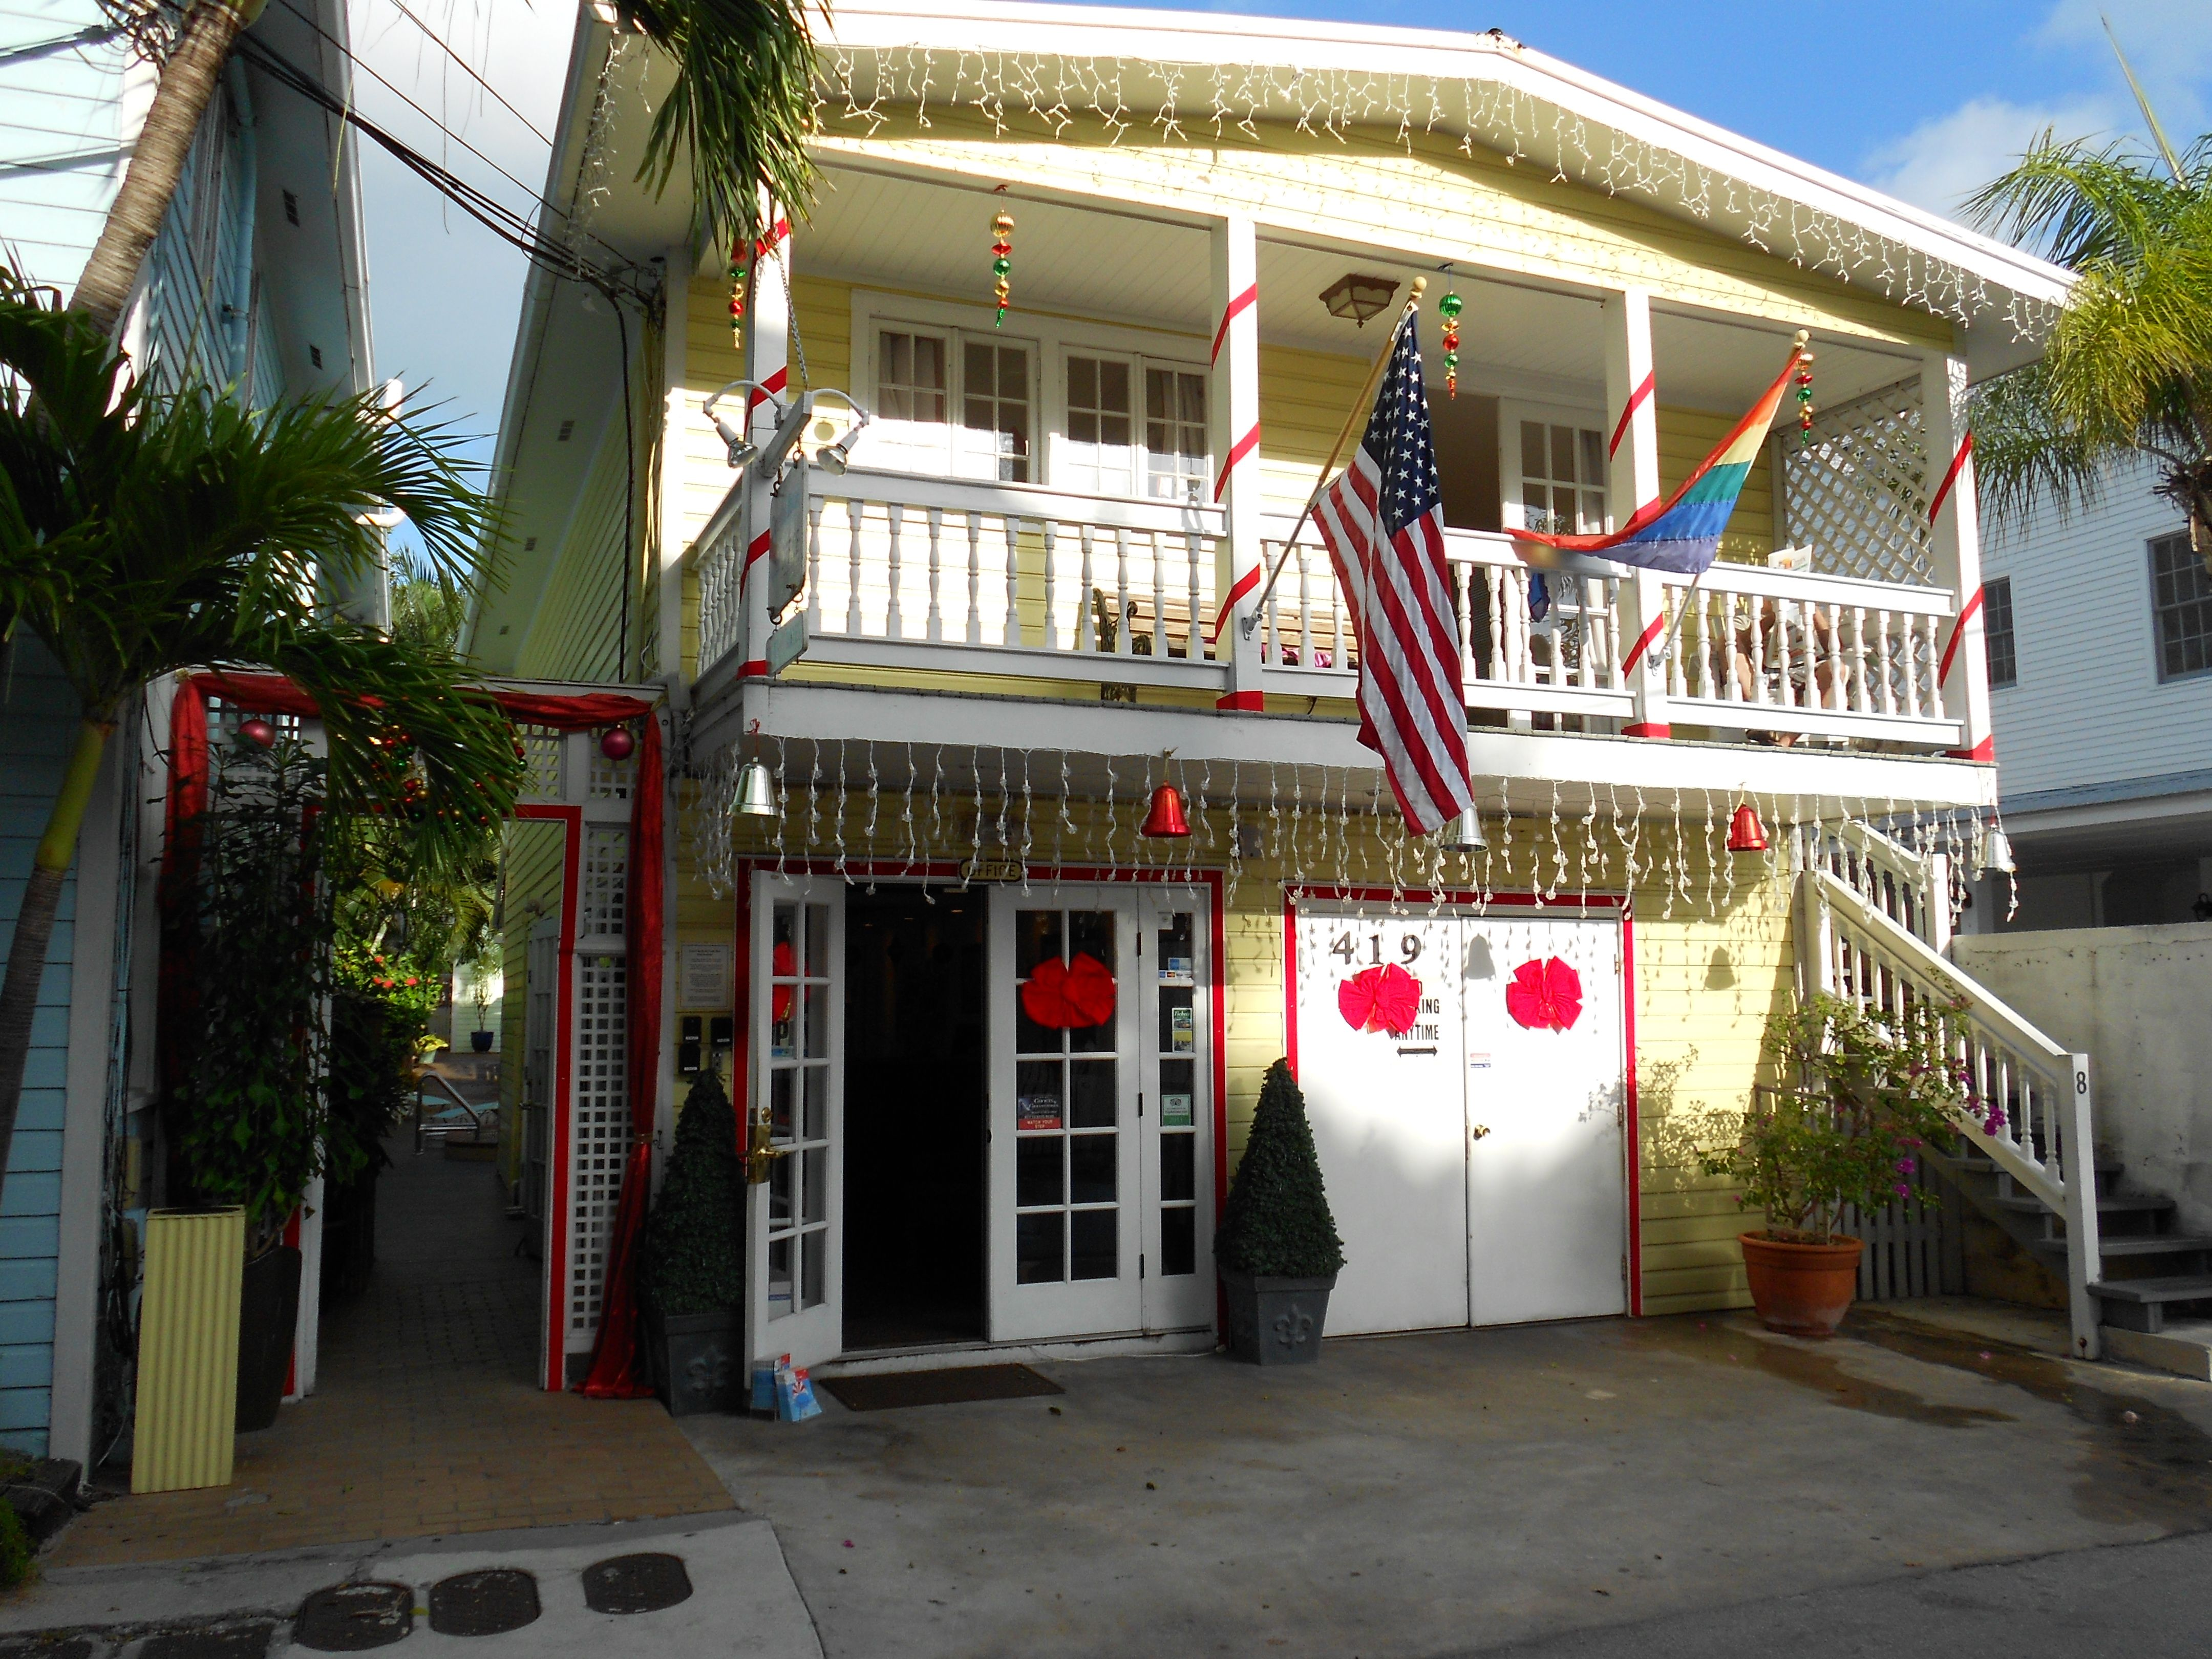 douglas house key west fl florida pinterest key west. Black Bedroom Furniture Sets. Home Design Ideas